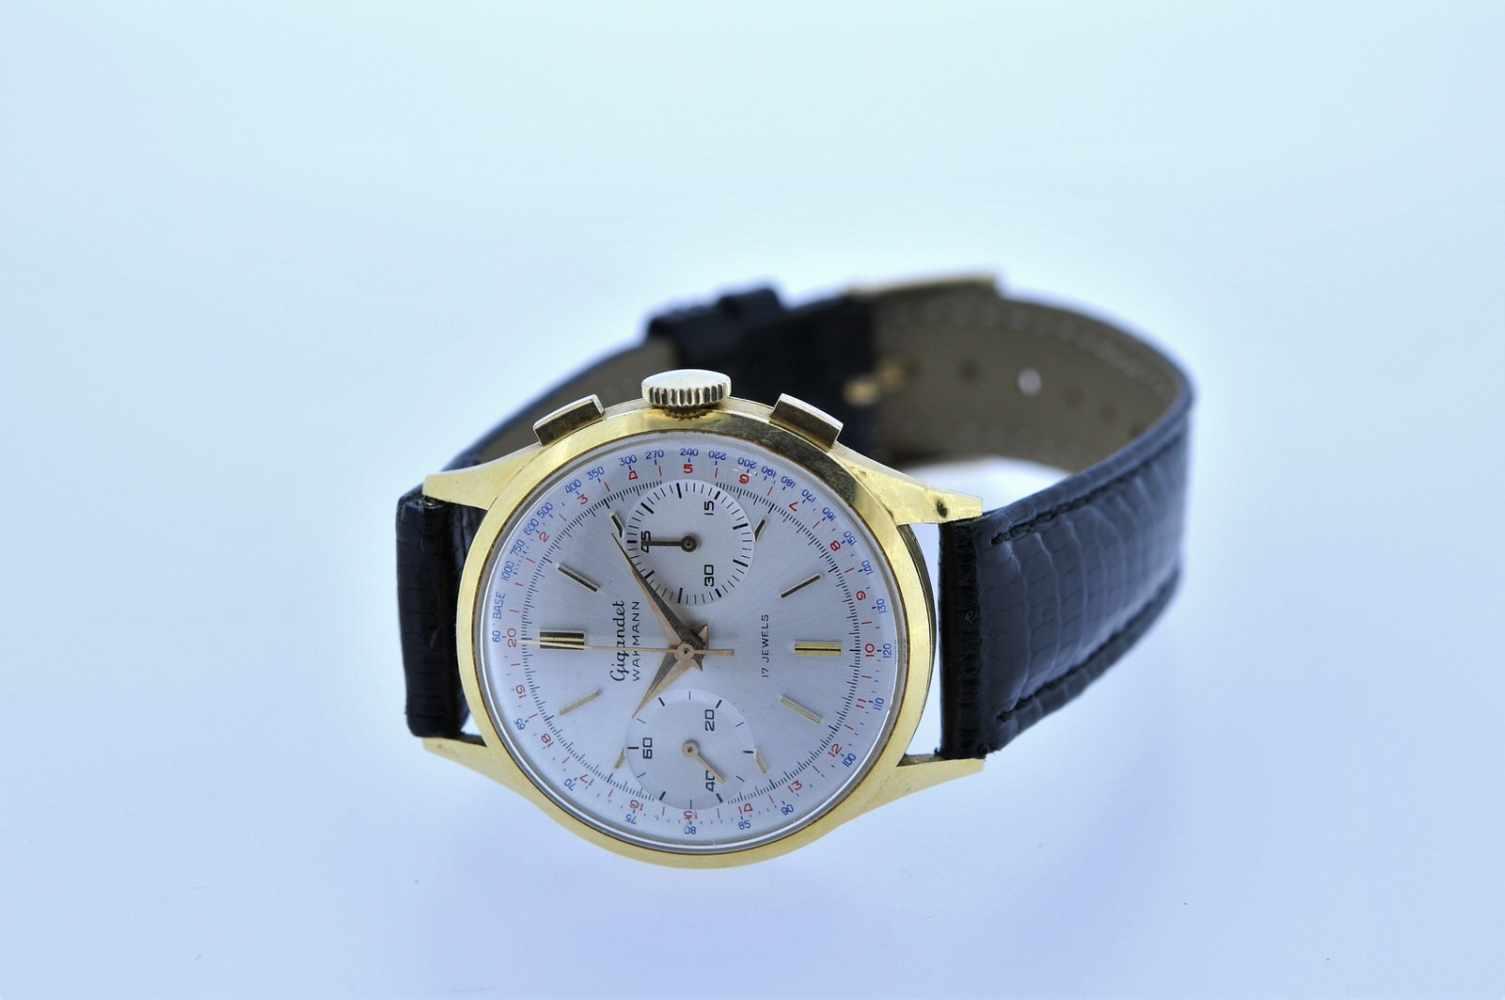 Gigandet Goldene 18karätige Armbanduhr an Lederband, Gigandet Wakmann, Chronograph, Stoppfunktion, - Bild 5 aus 5